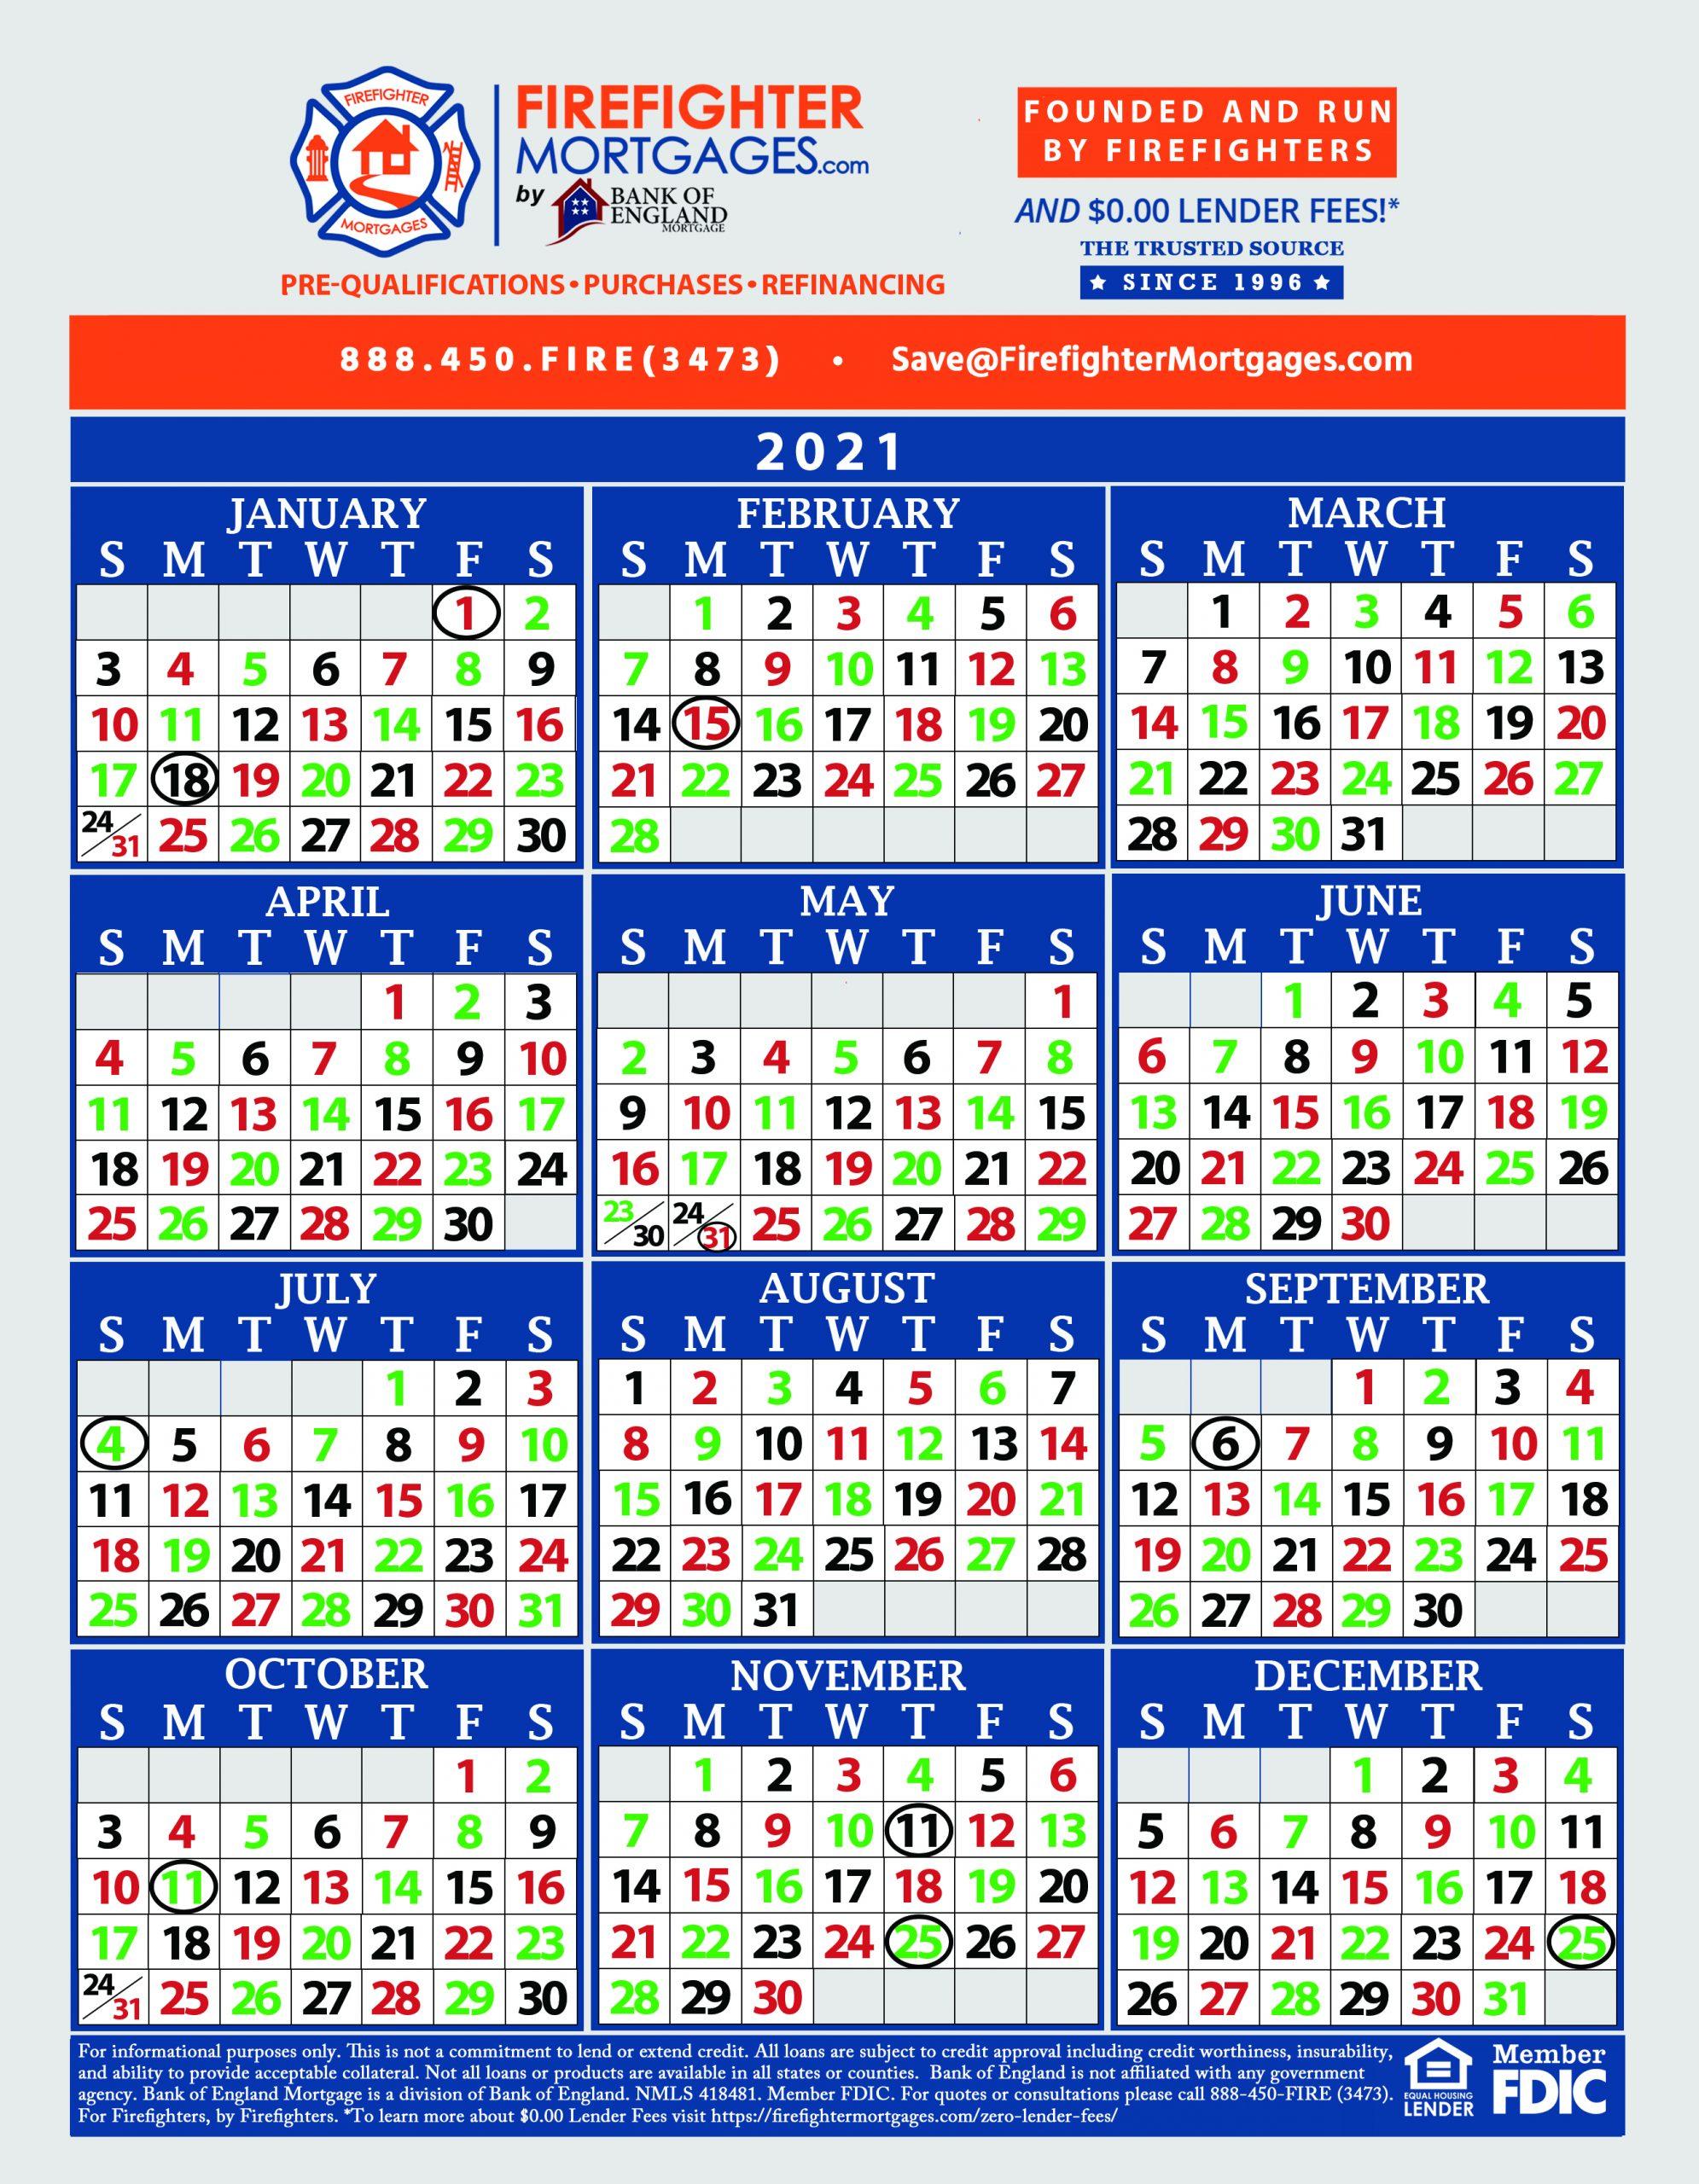 Firefighter Shift Calendars - Firefighter Mortgages® pertaining to Firehouse Shift Calendar